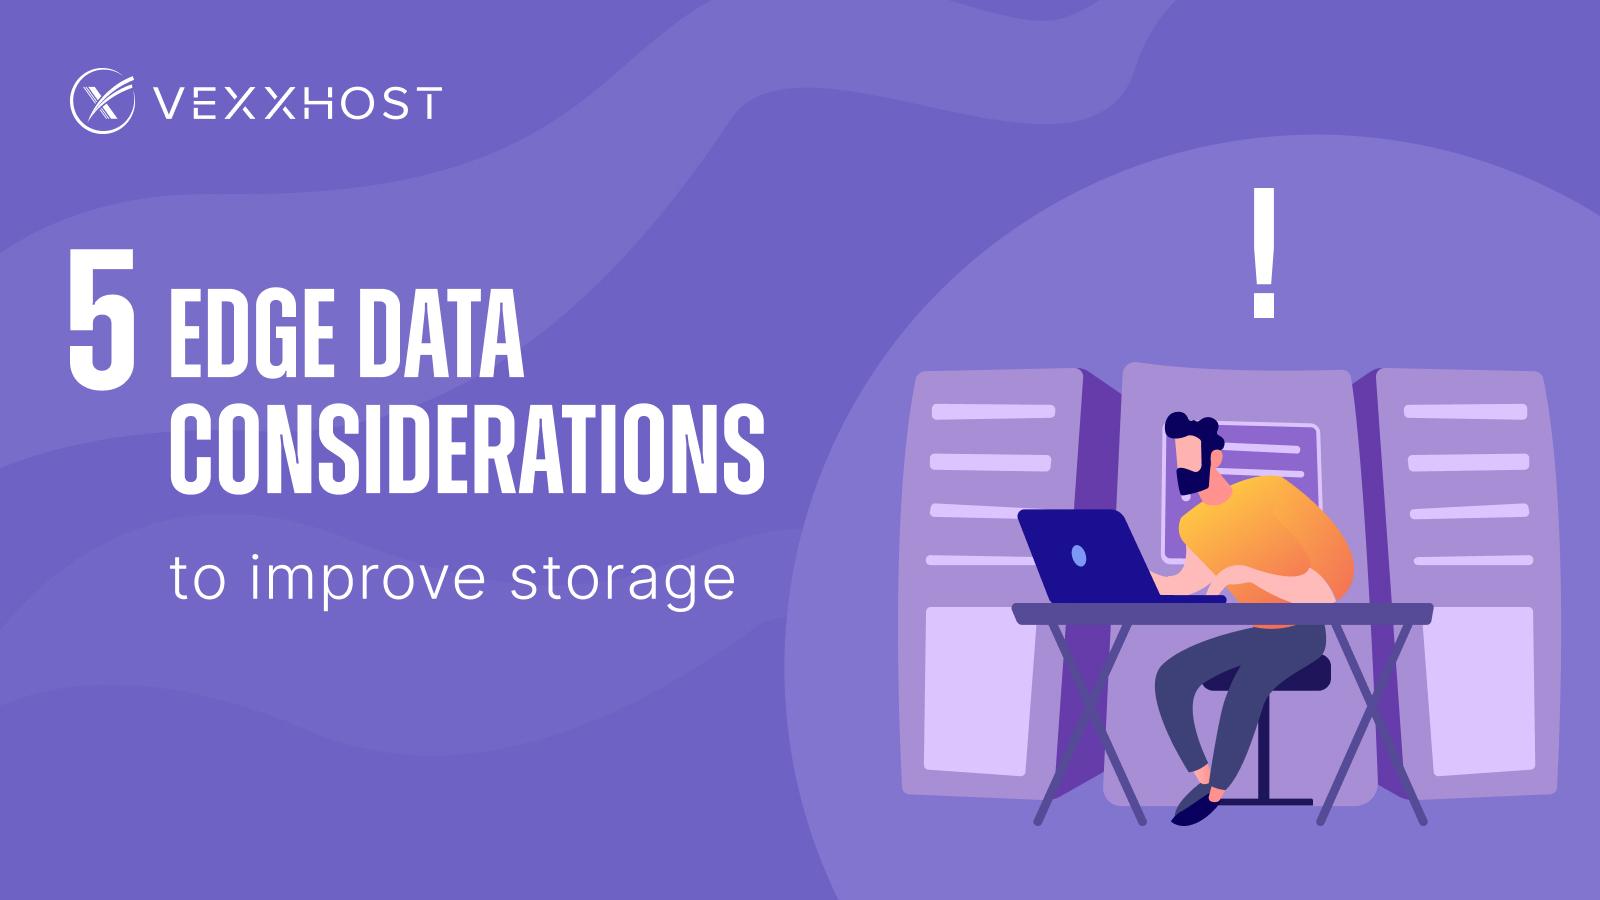 5 Edge Data Considerations to Improve Storage